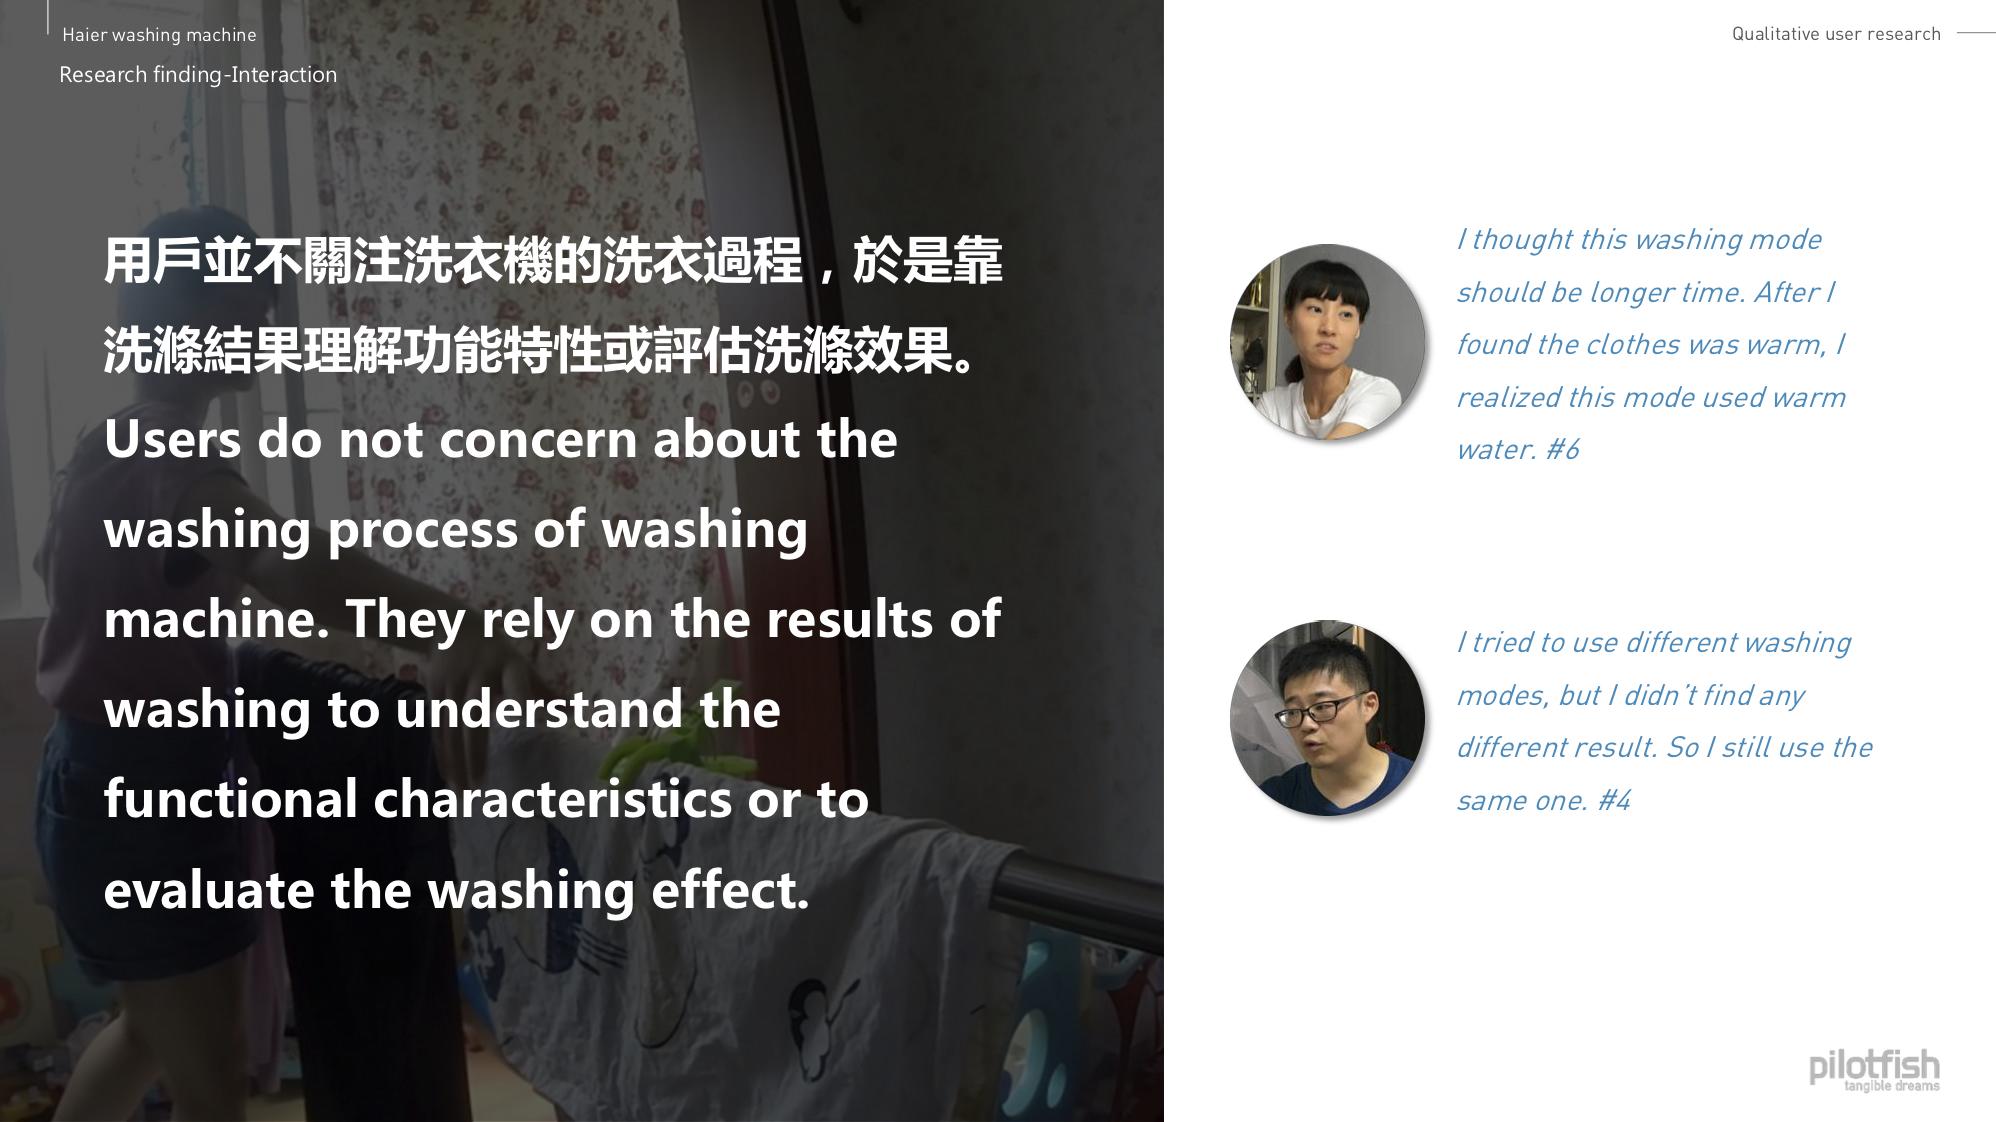 20170727_Haier_washing machine innovative UI_P0 presentation_V4_Eng_21.jpg